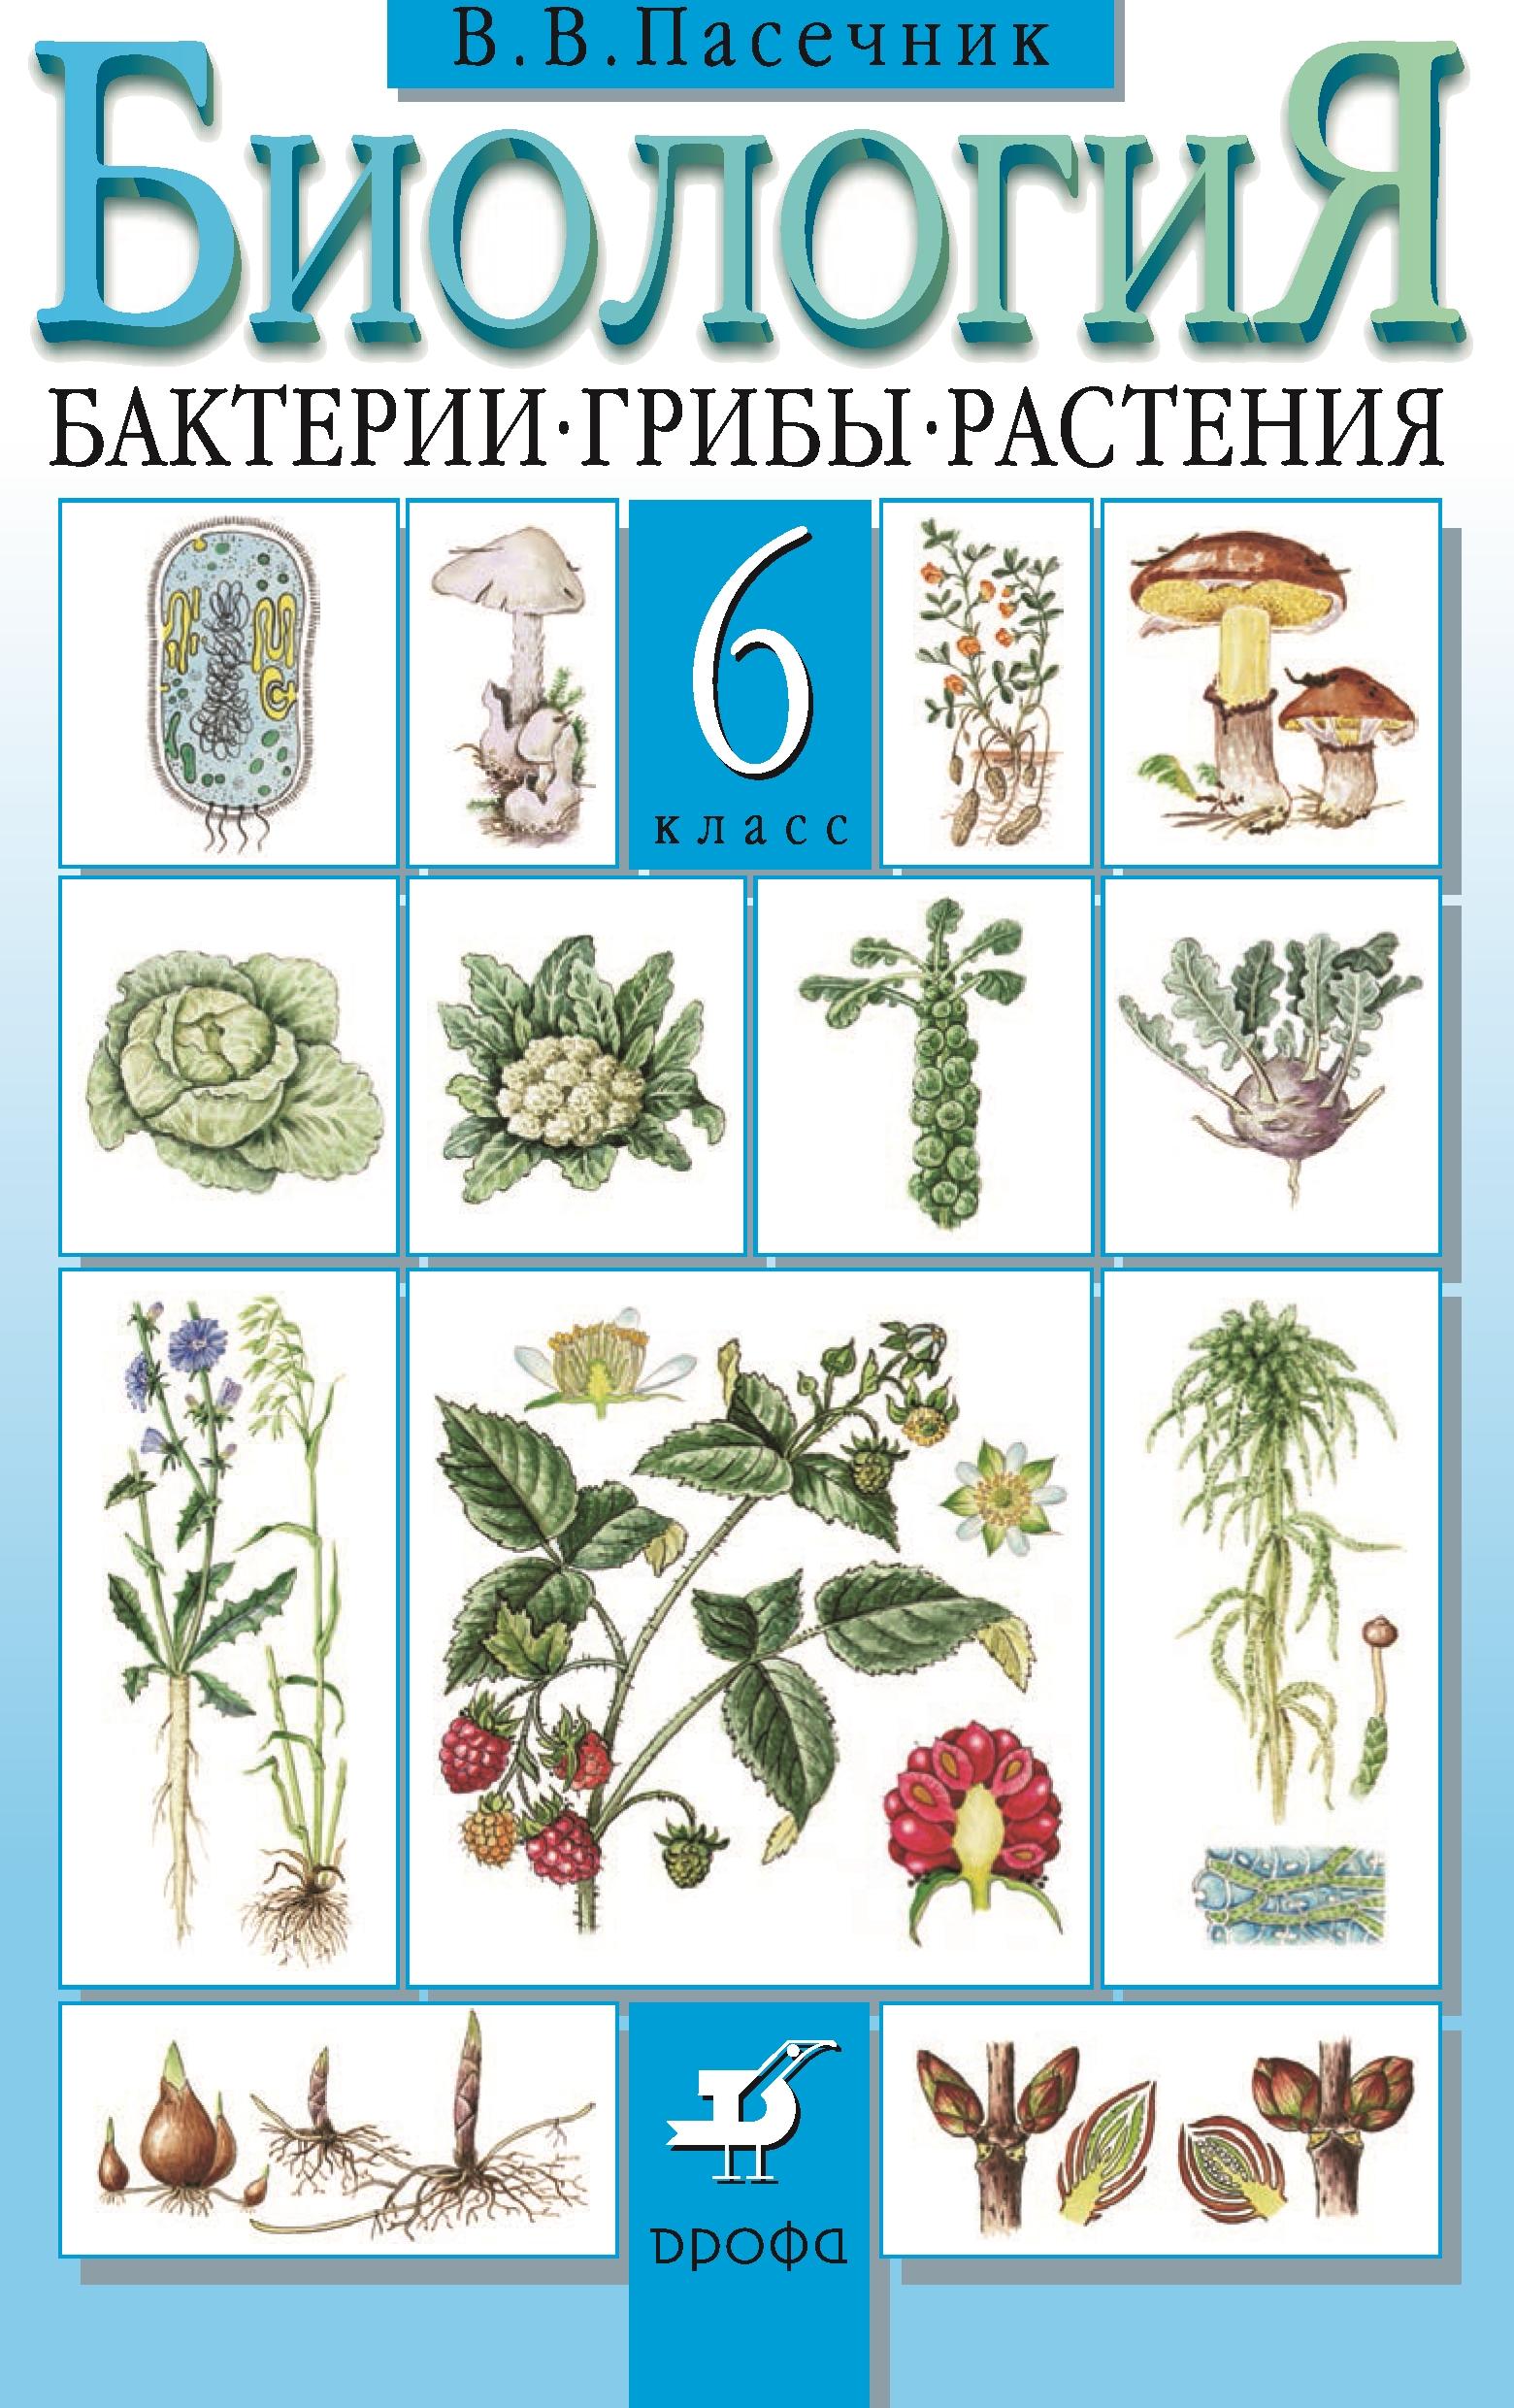 Биология. Бактерии, грибы, растения.6 класс